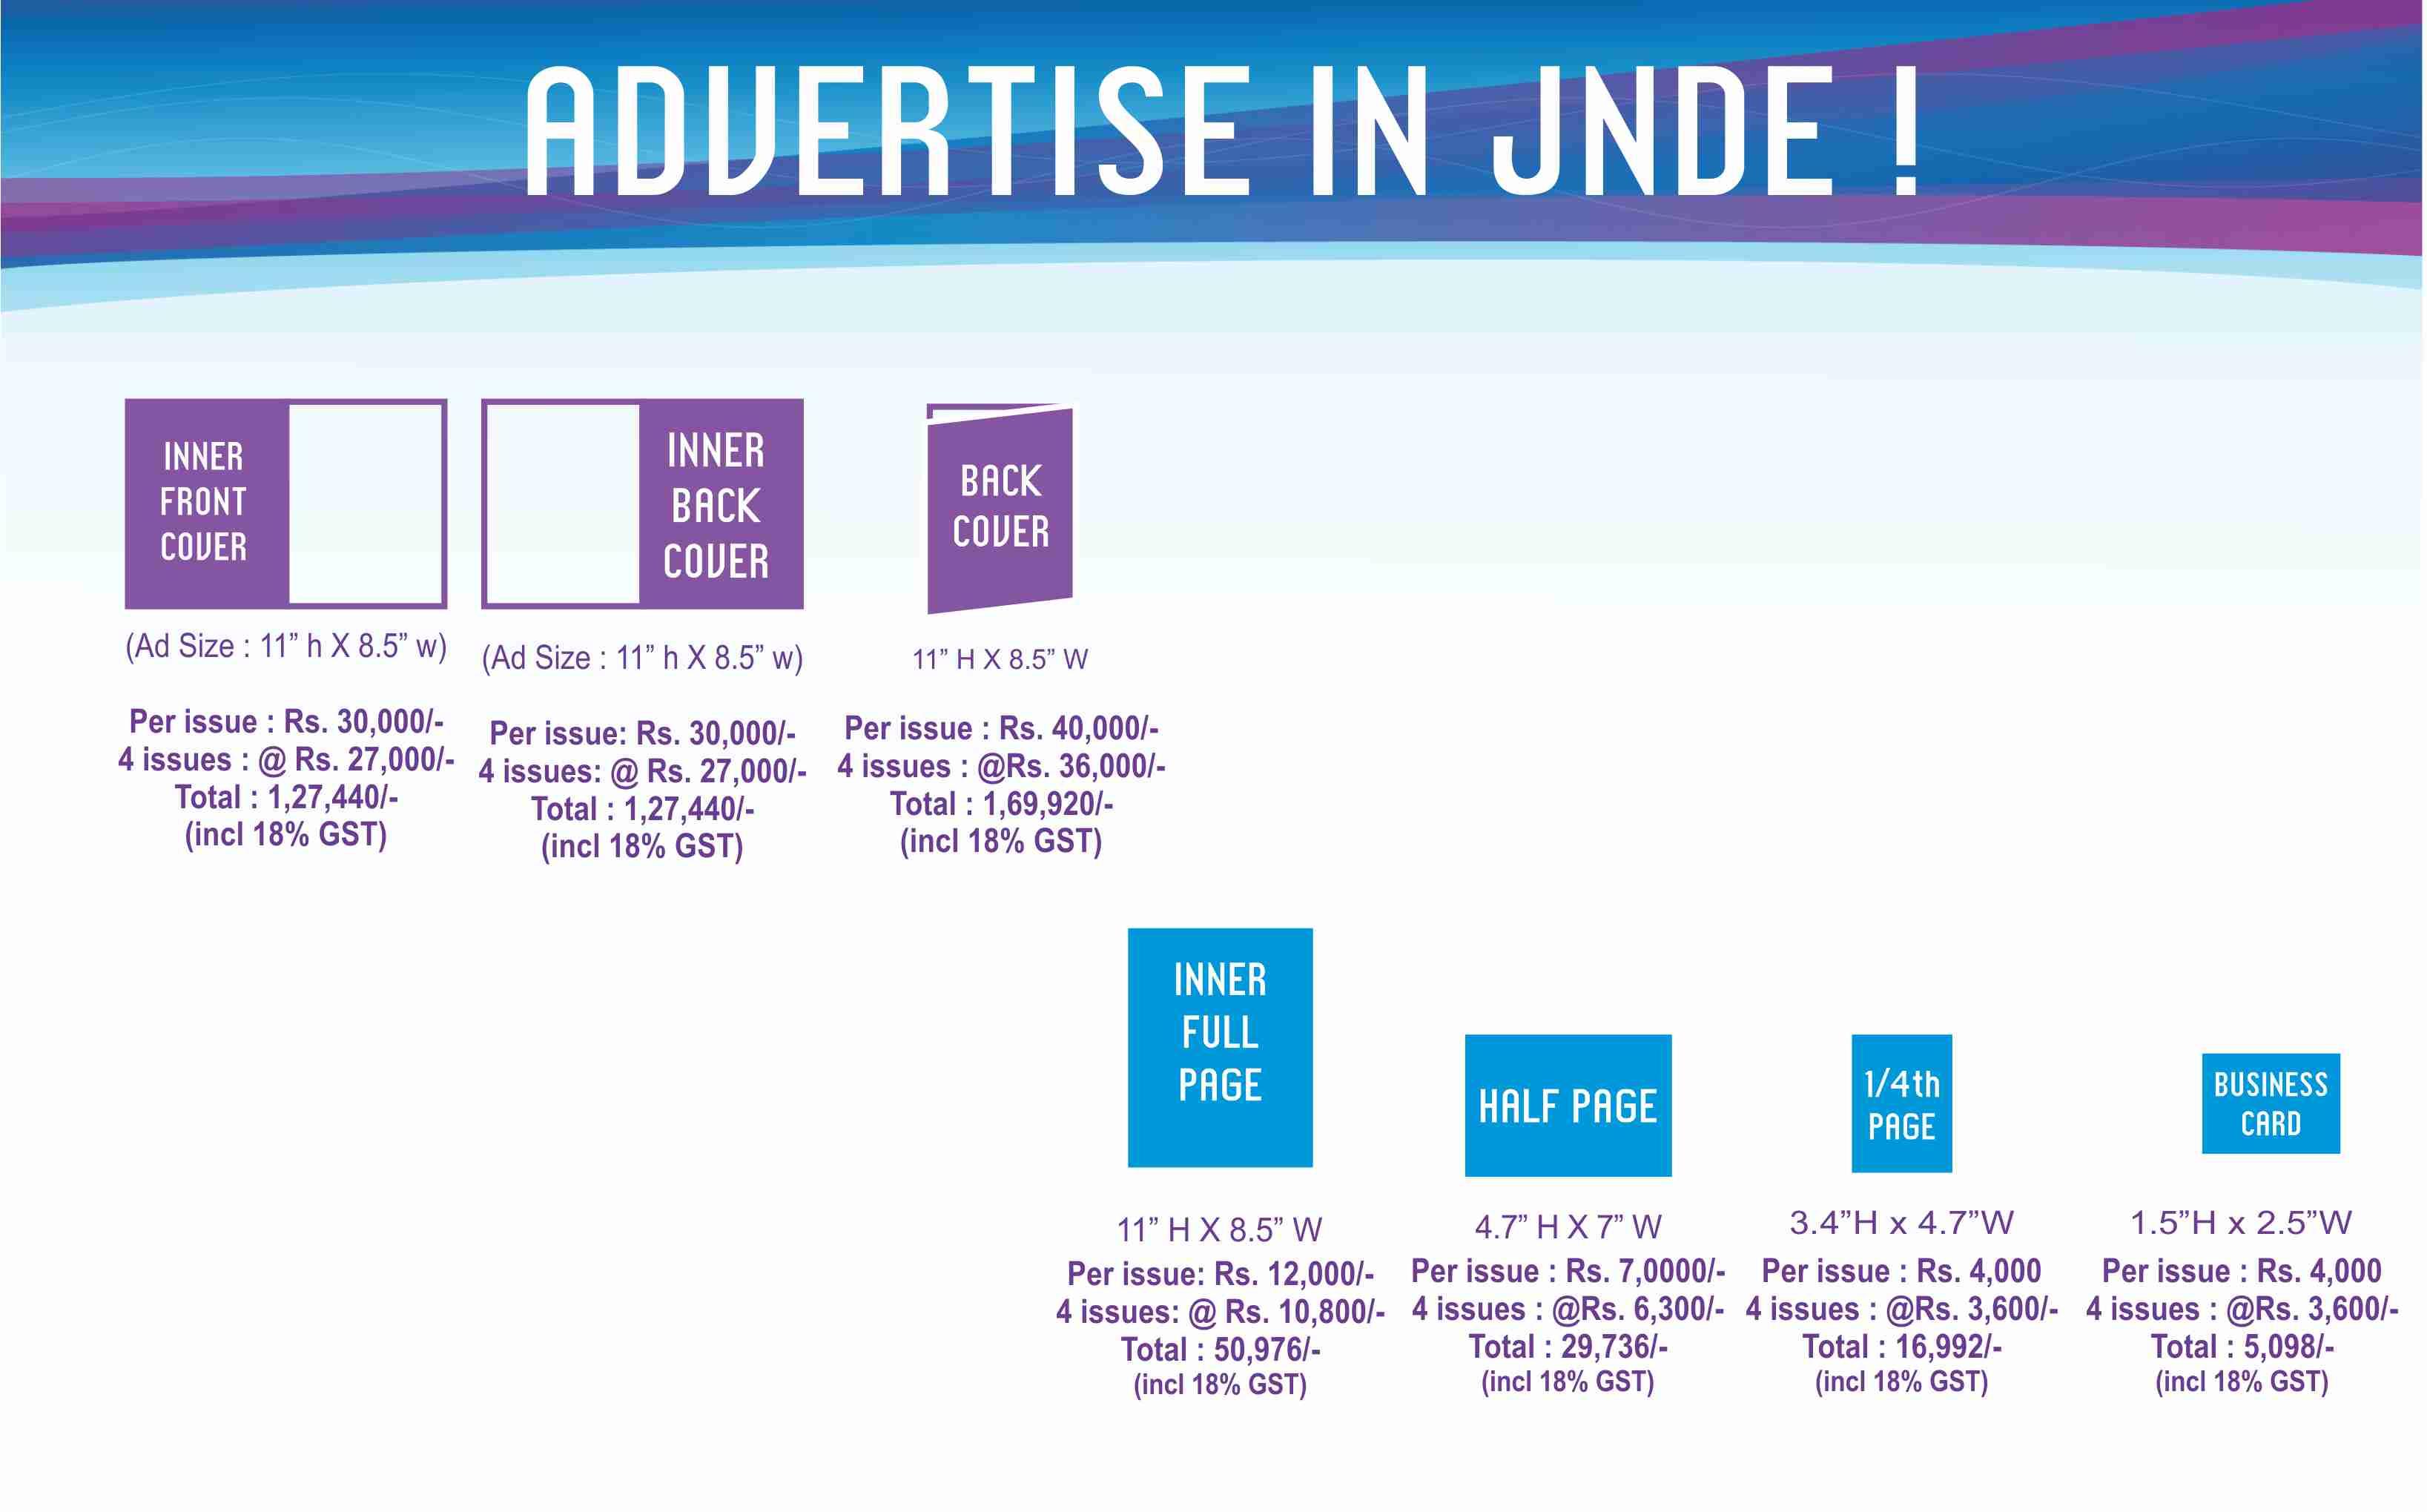 JNDE tariff